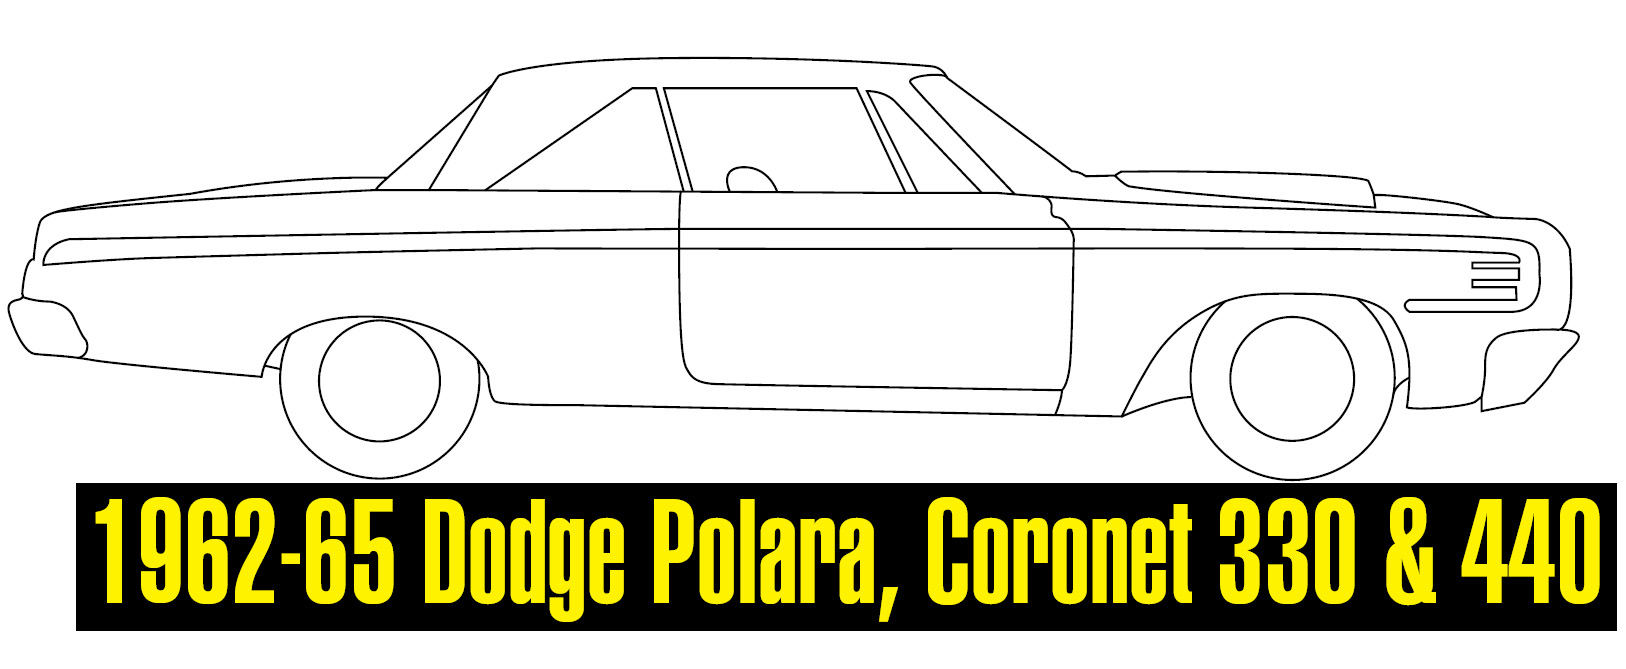 Classic_Dodge_62_Polara_Coronet